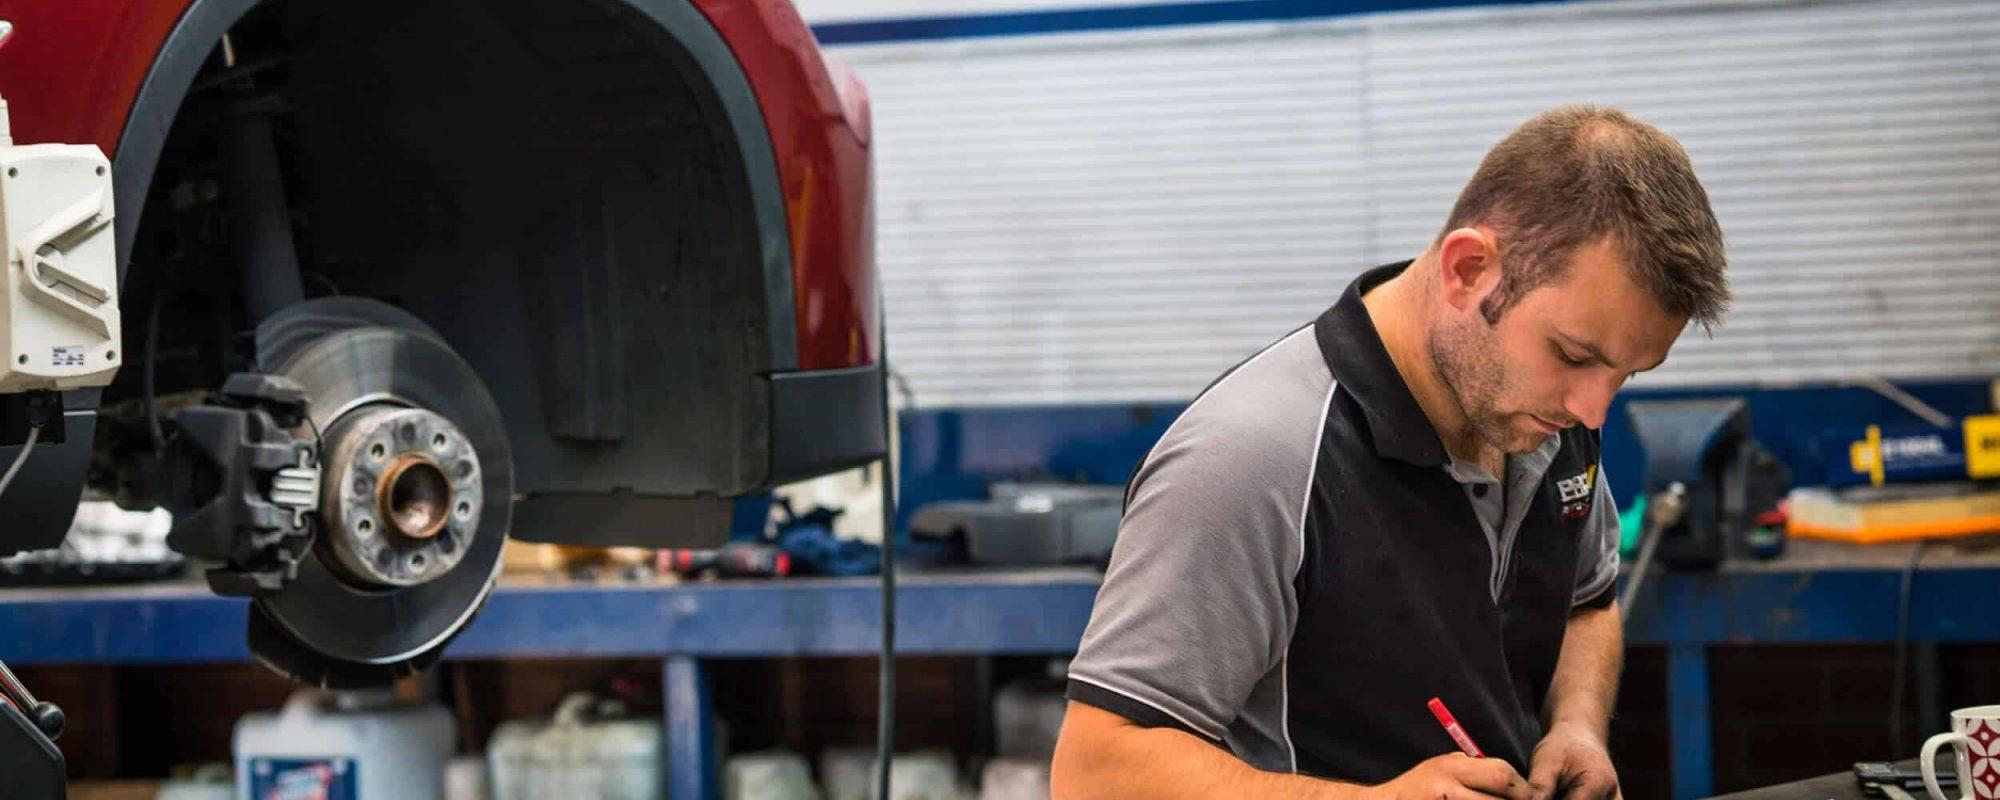 mechanic perth